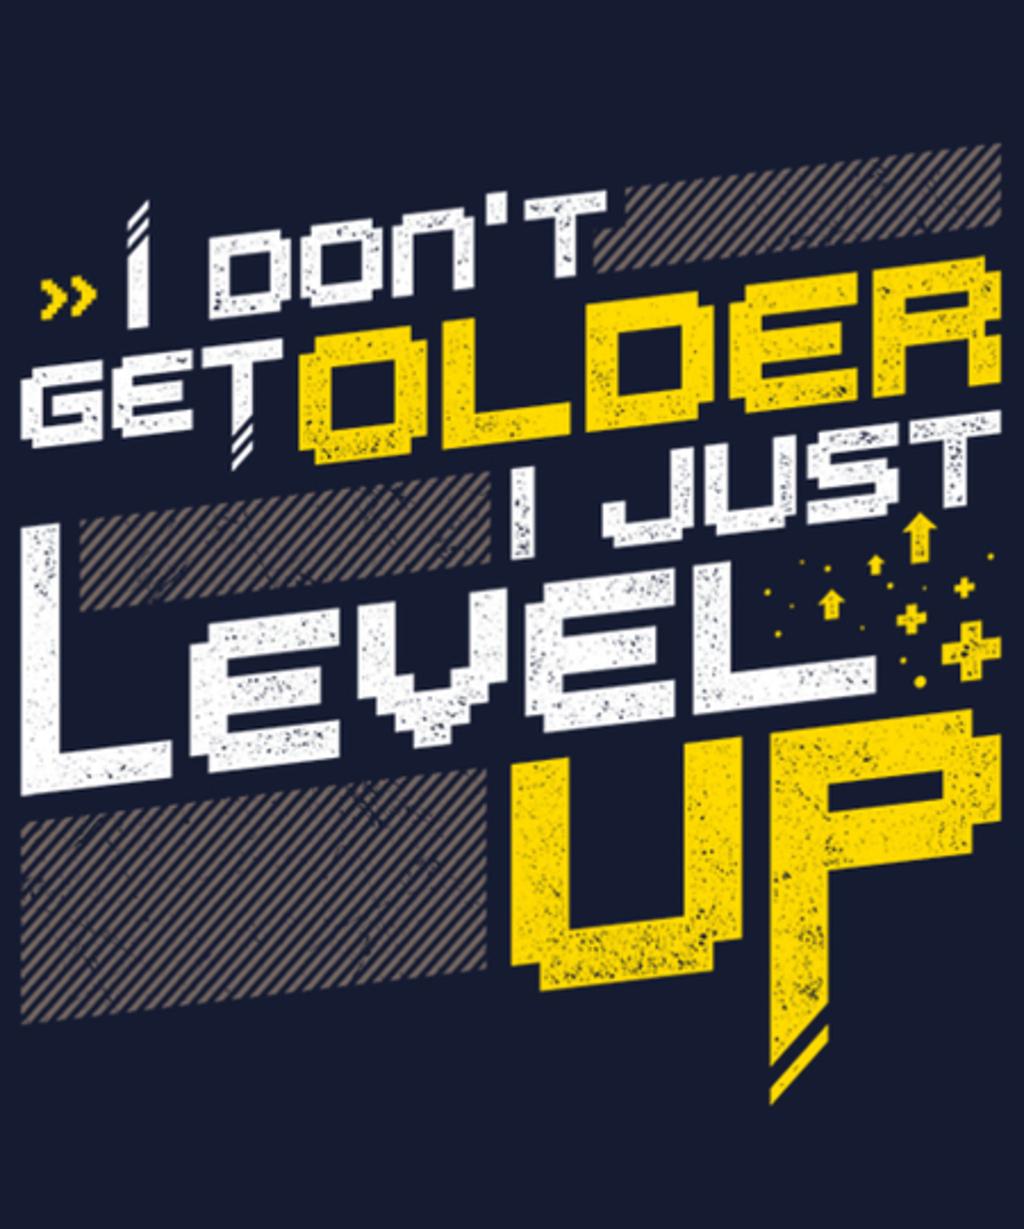 Qwertee: Level UP